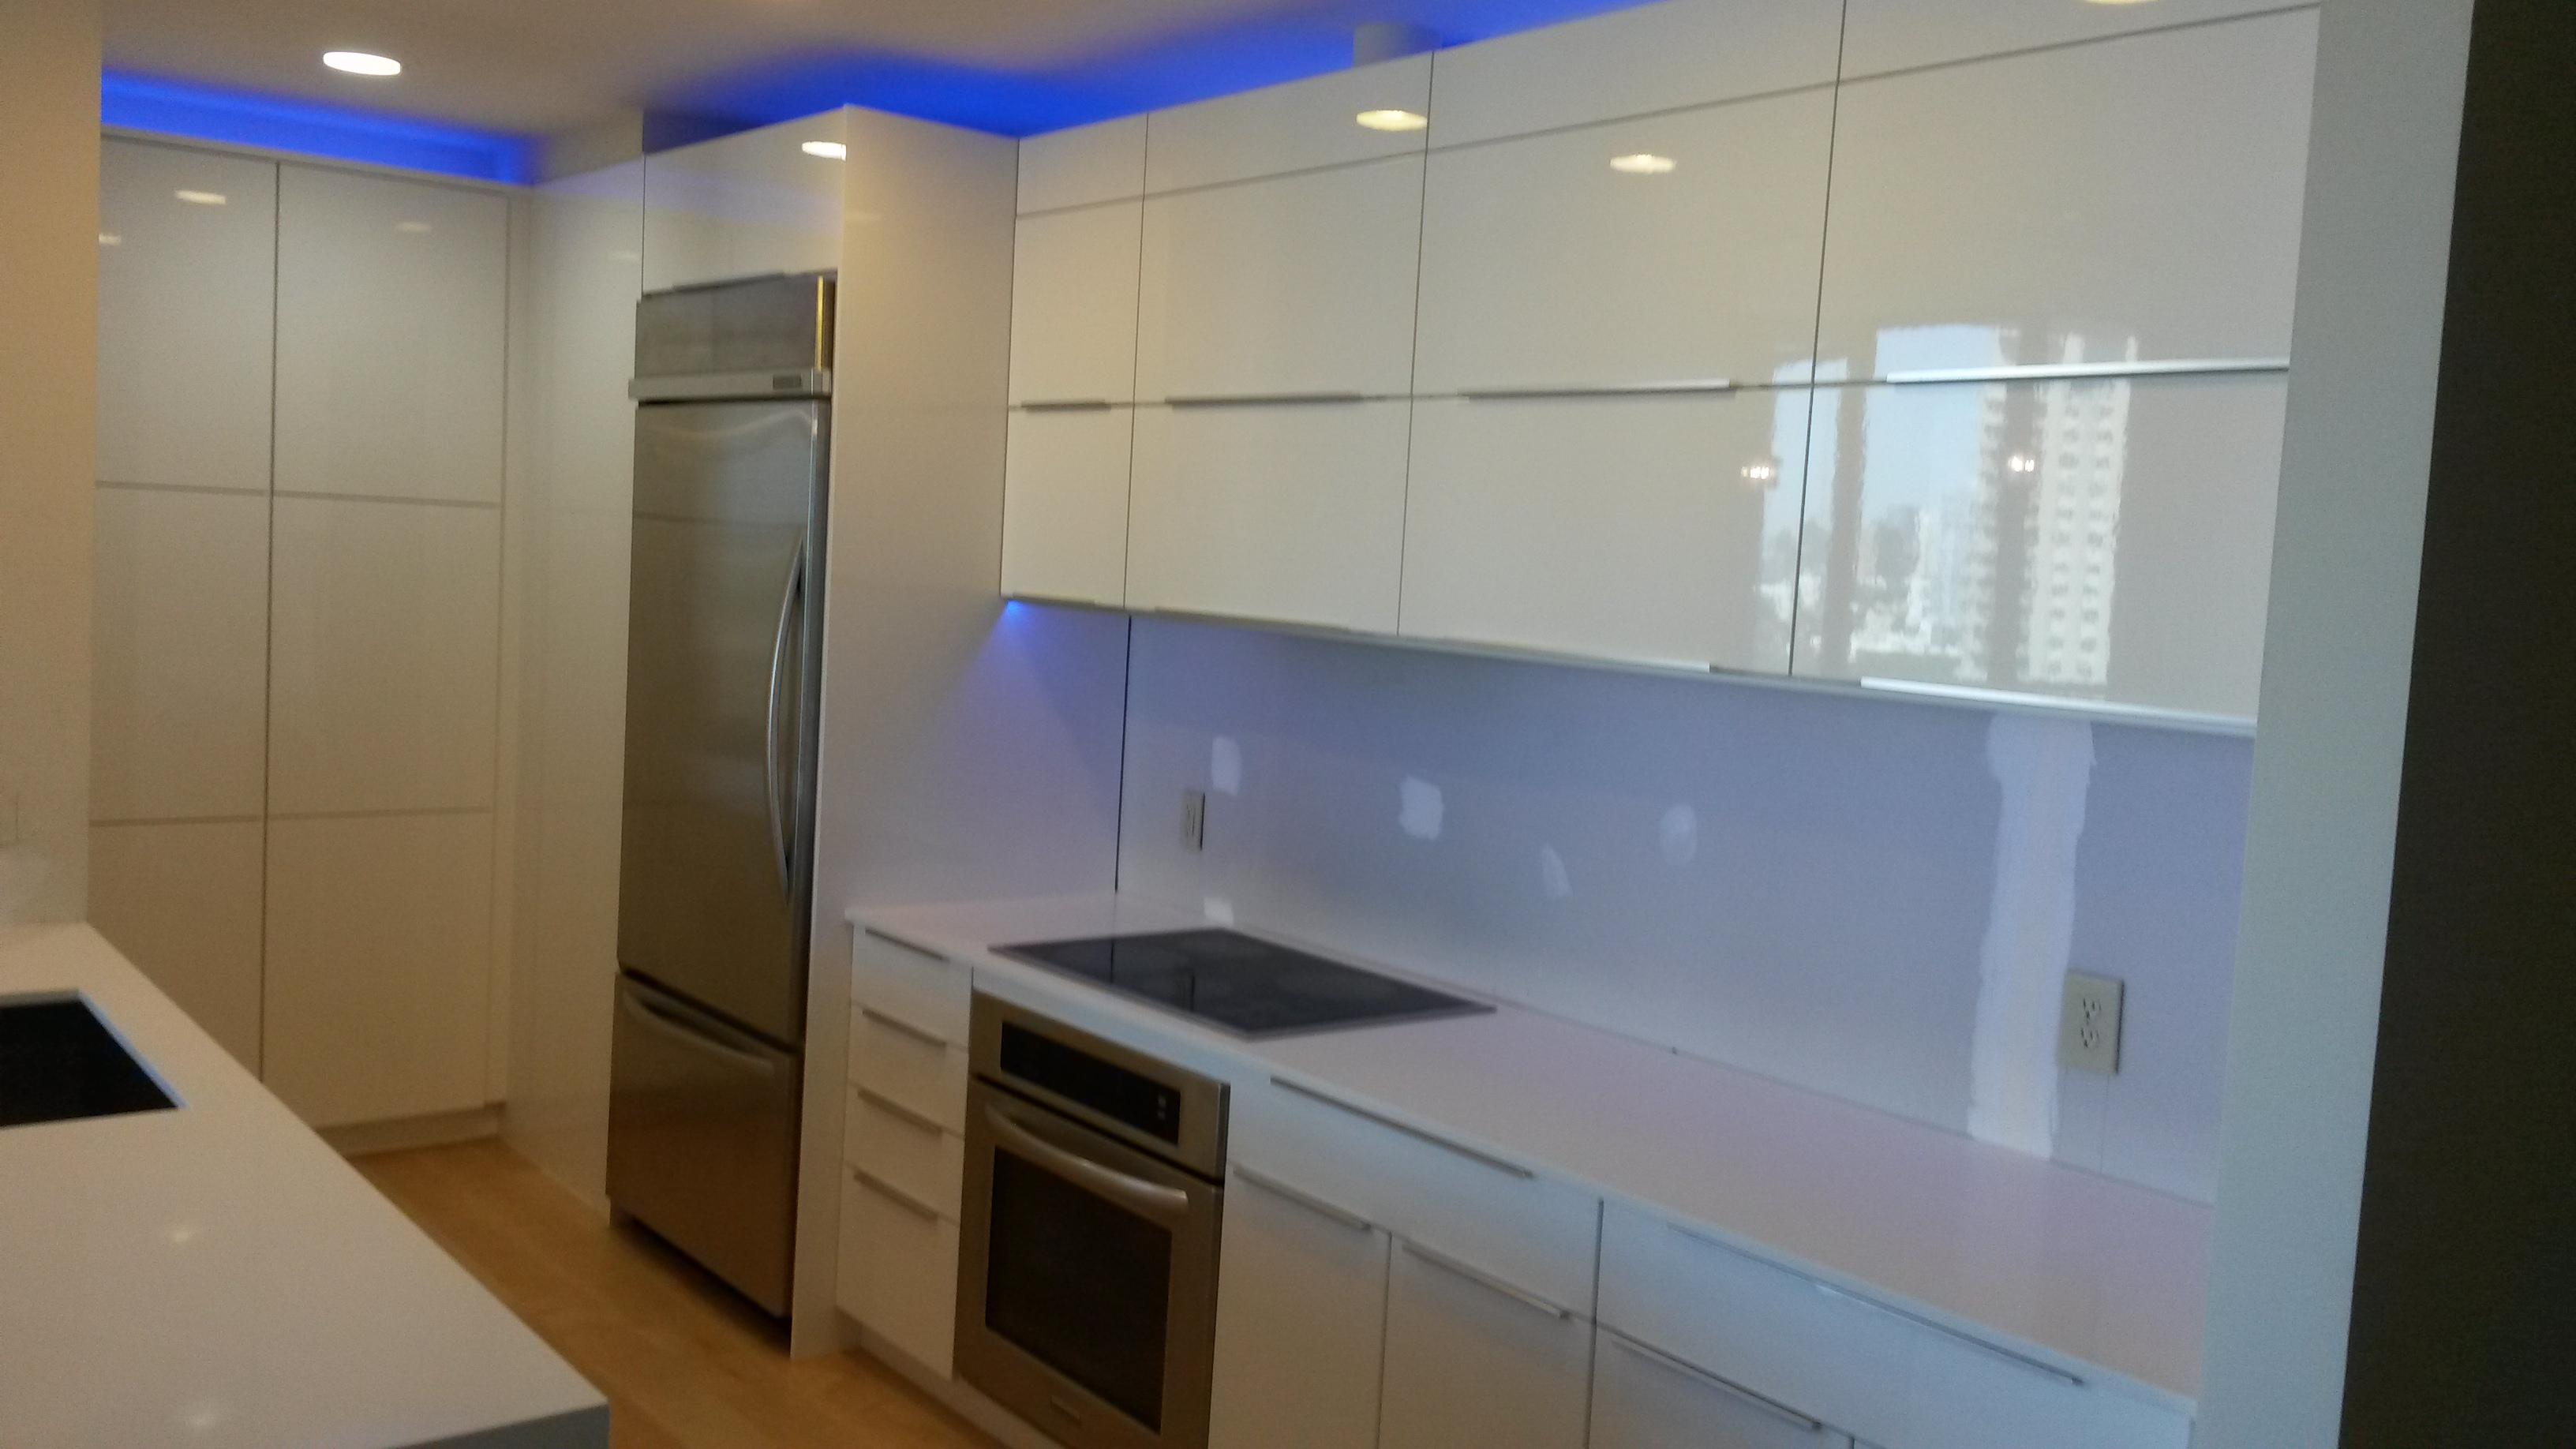 estimate for kitchen cabinets doors mccrossin industries inc. | ikea installation ...